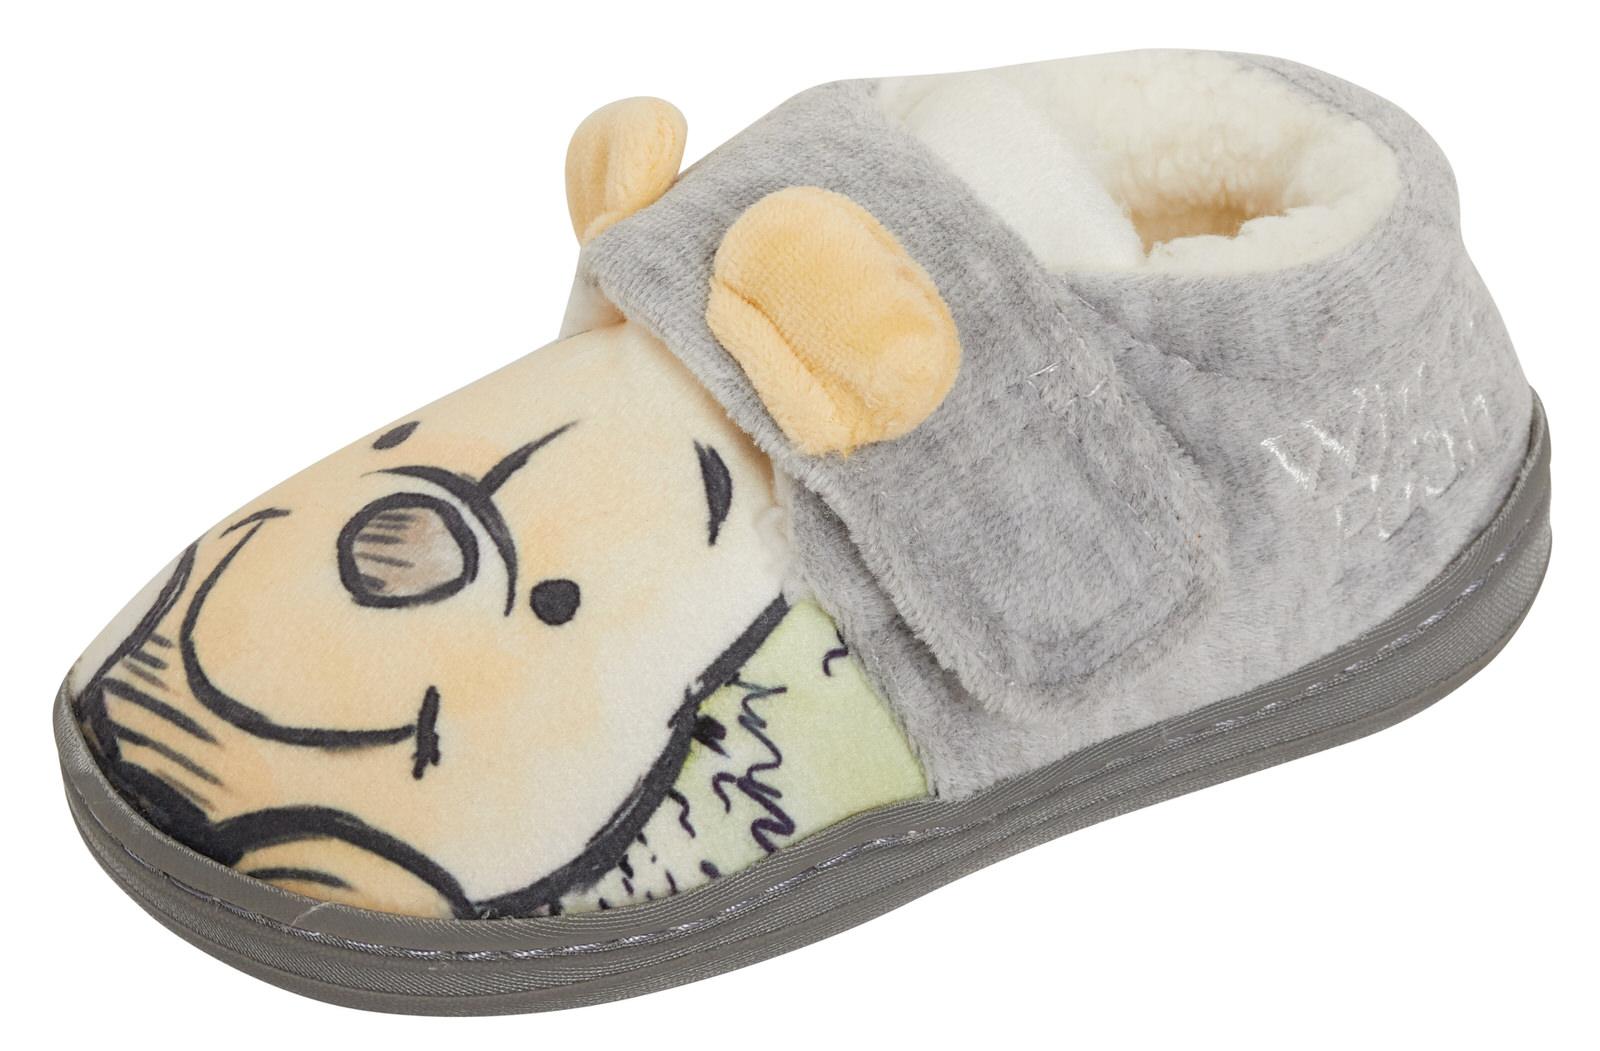 Disney Winnie The Pooh 3D Slippers Boys